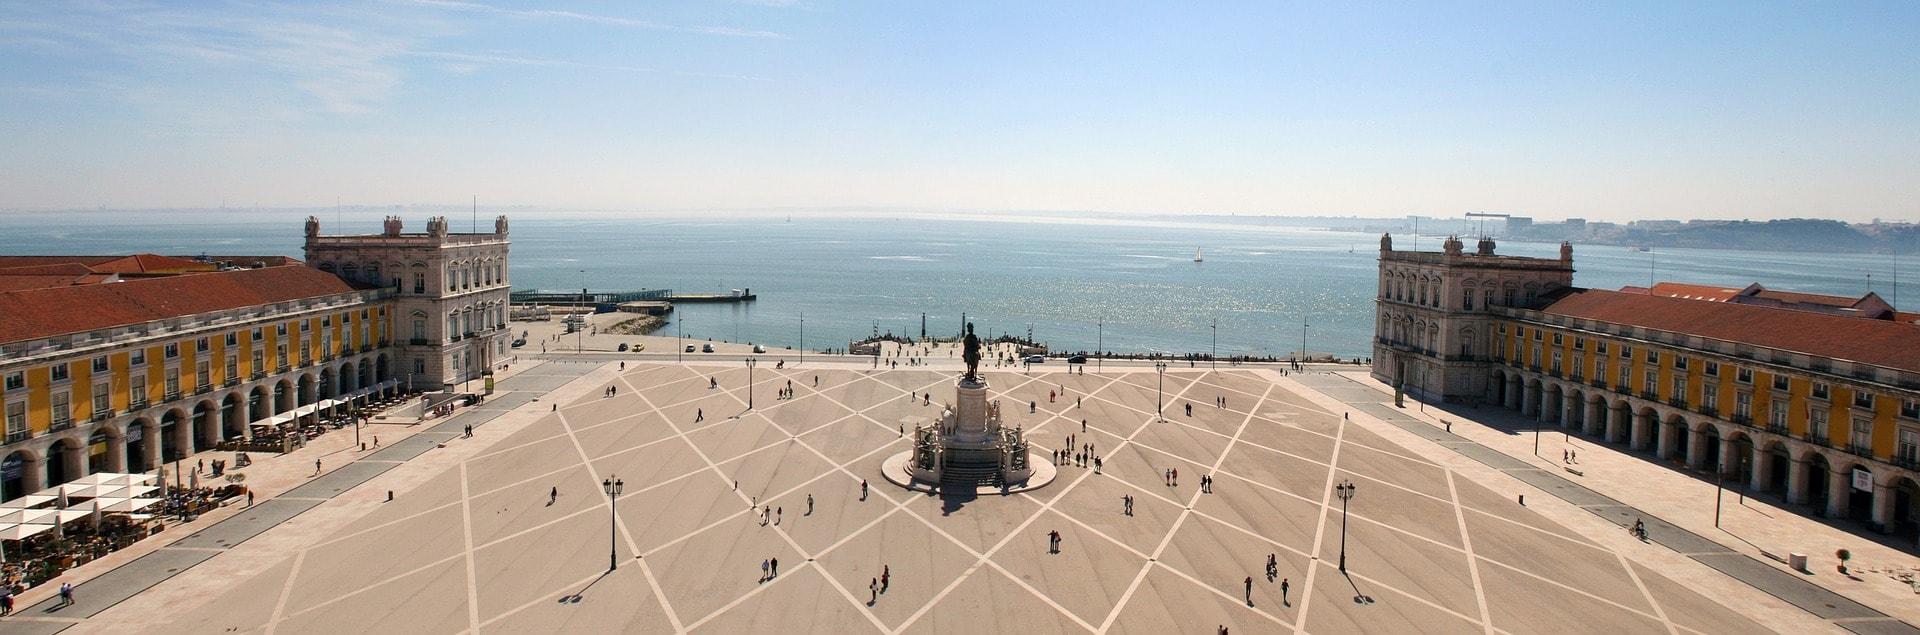 Yard of the Palace Lisbon